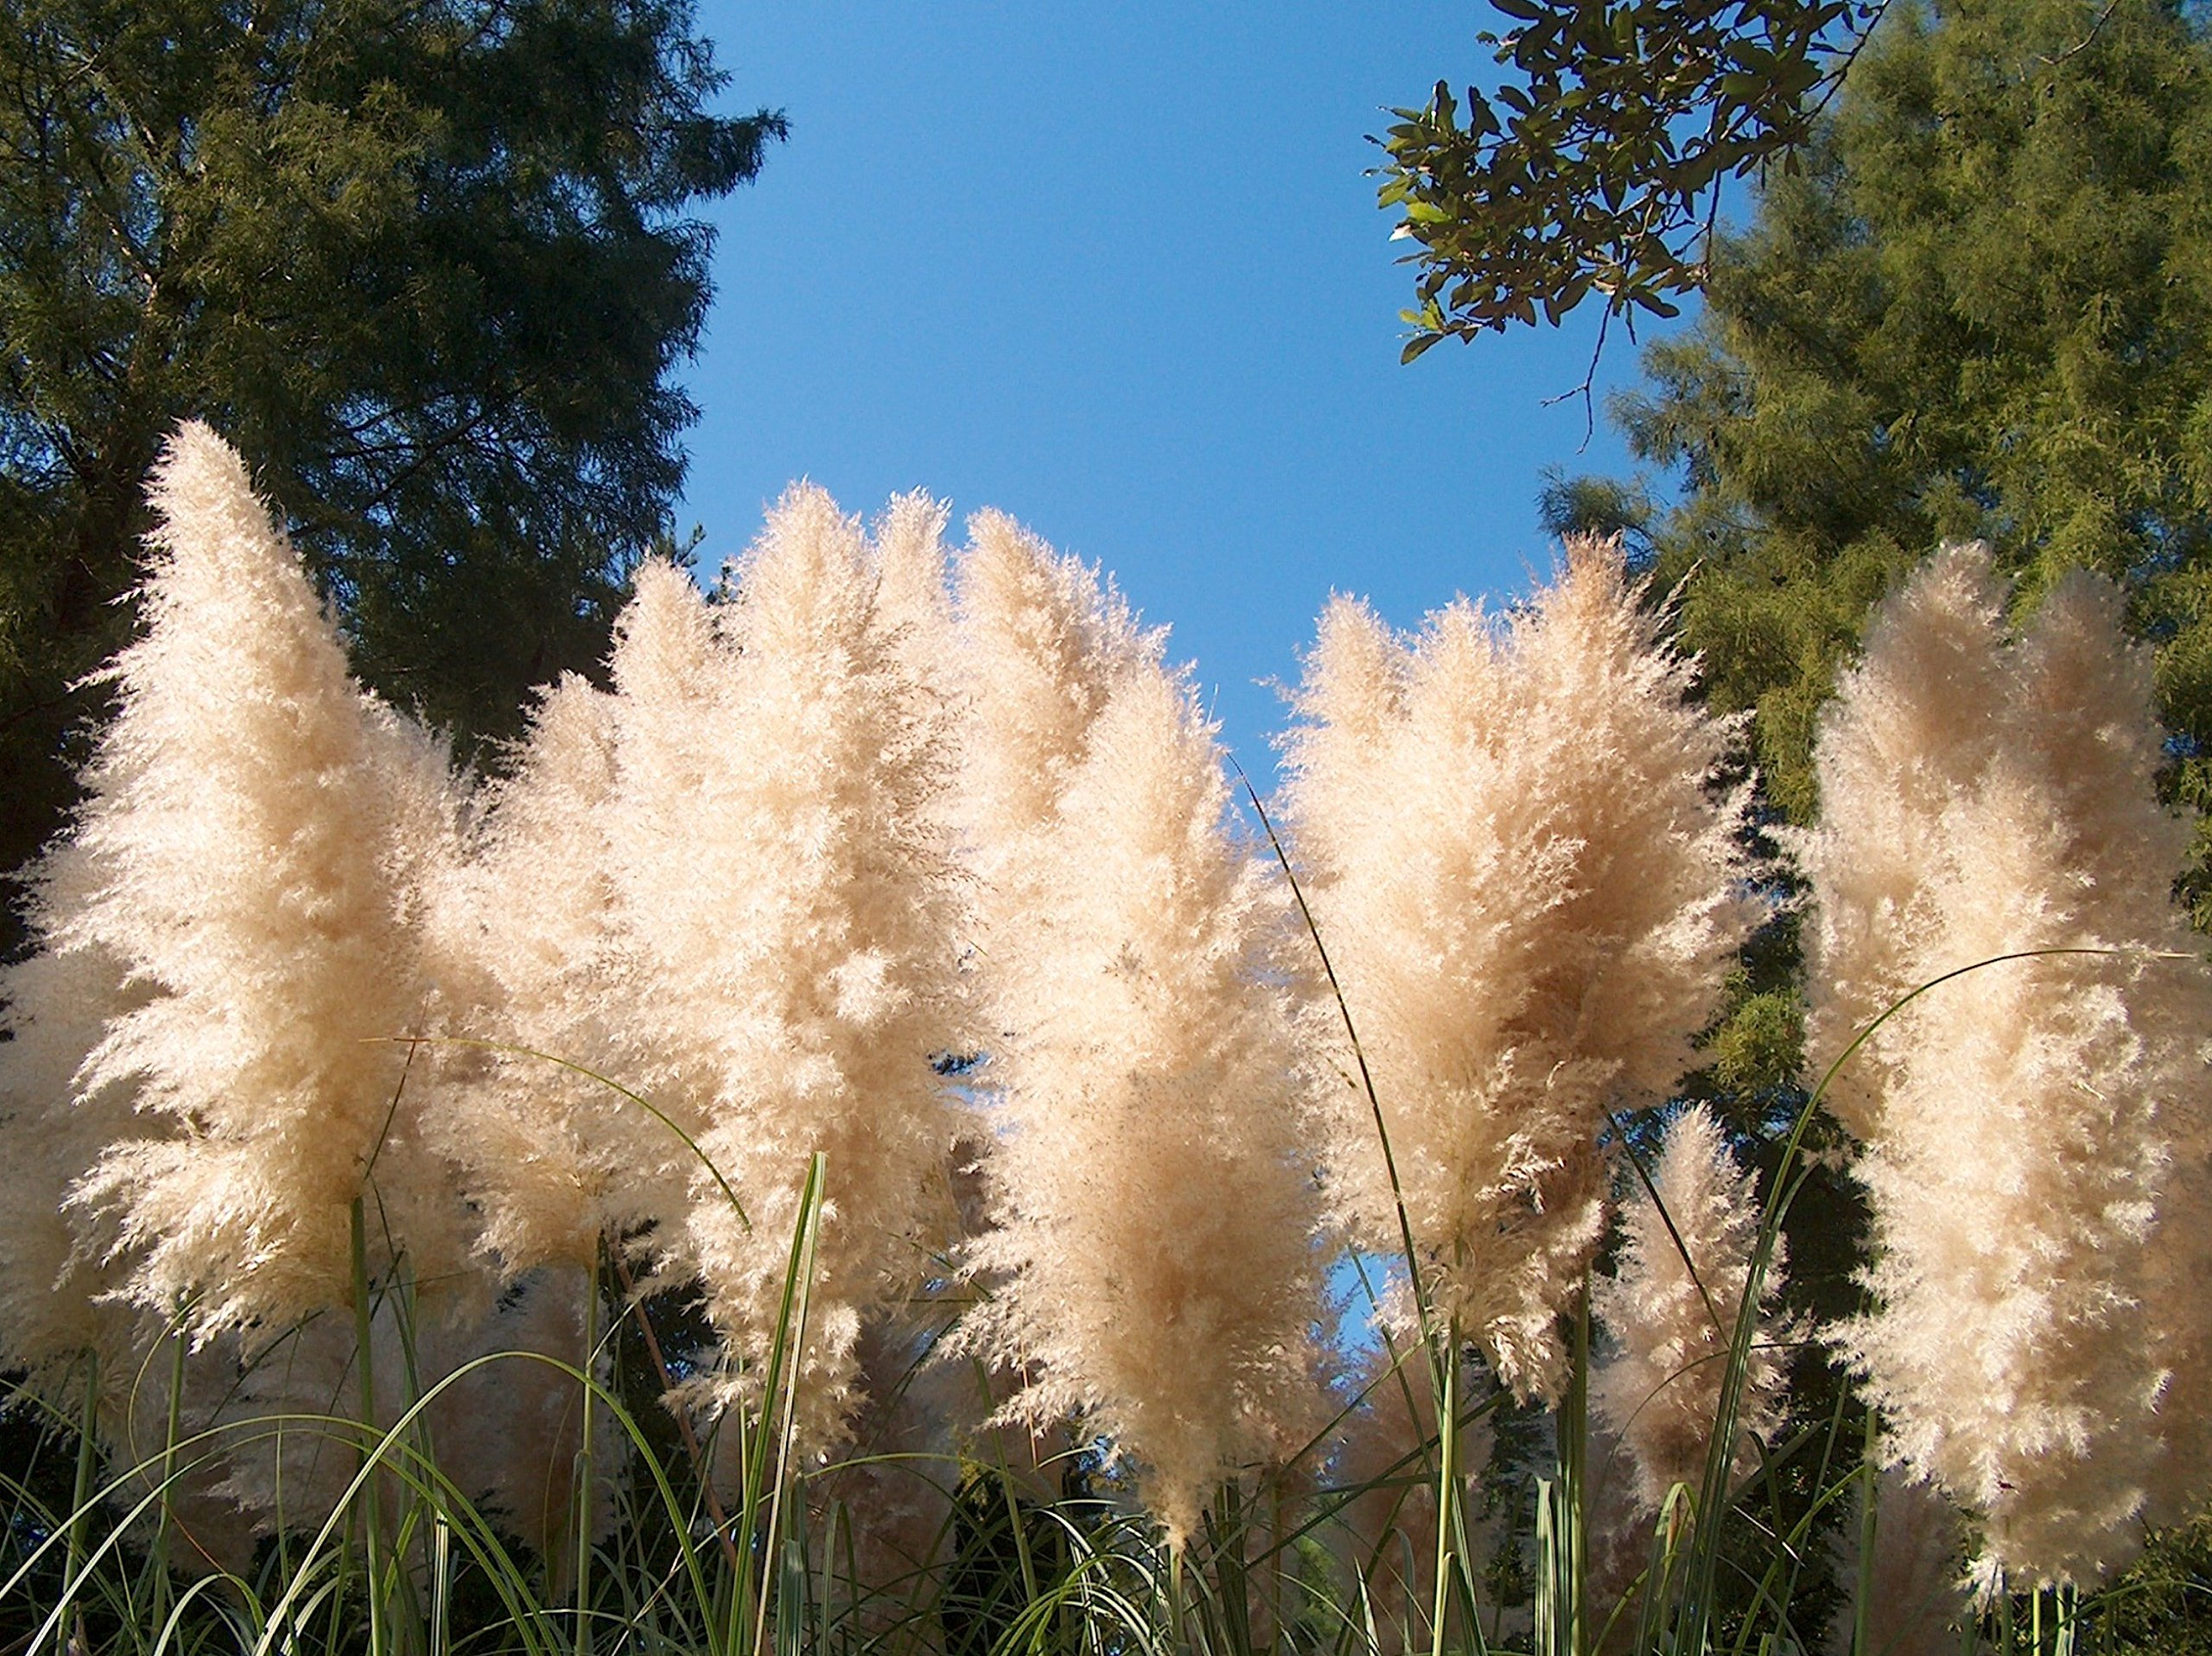 Pampas Grass Qty 15 Live Plants Cortaderia Selloana Showy Blooms by Florida Foliage